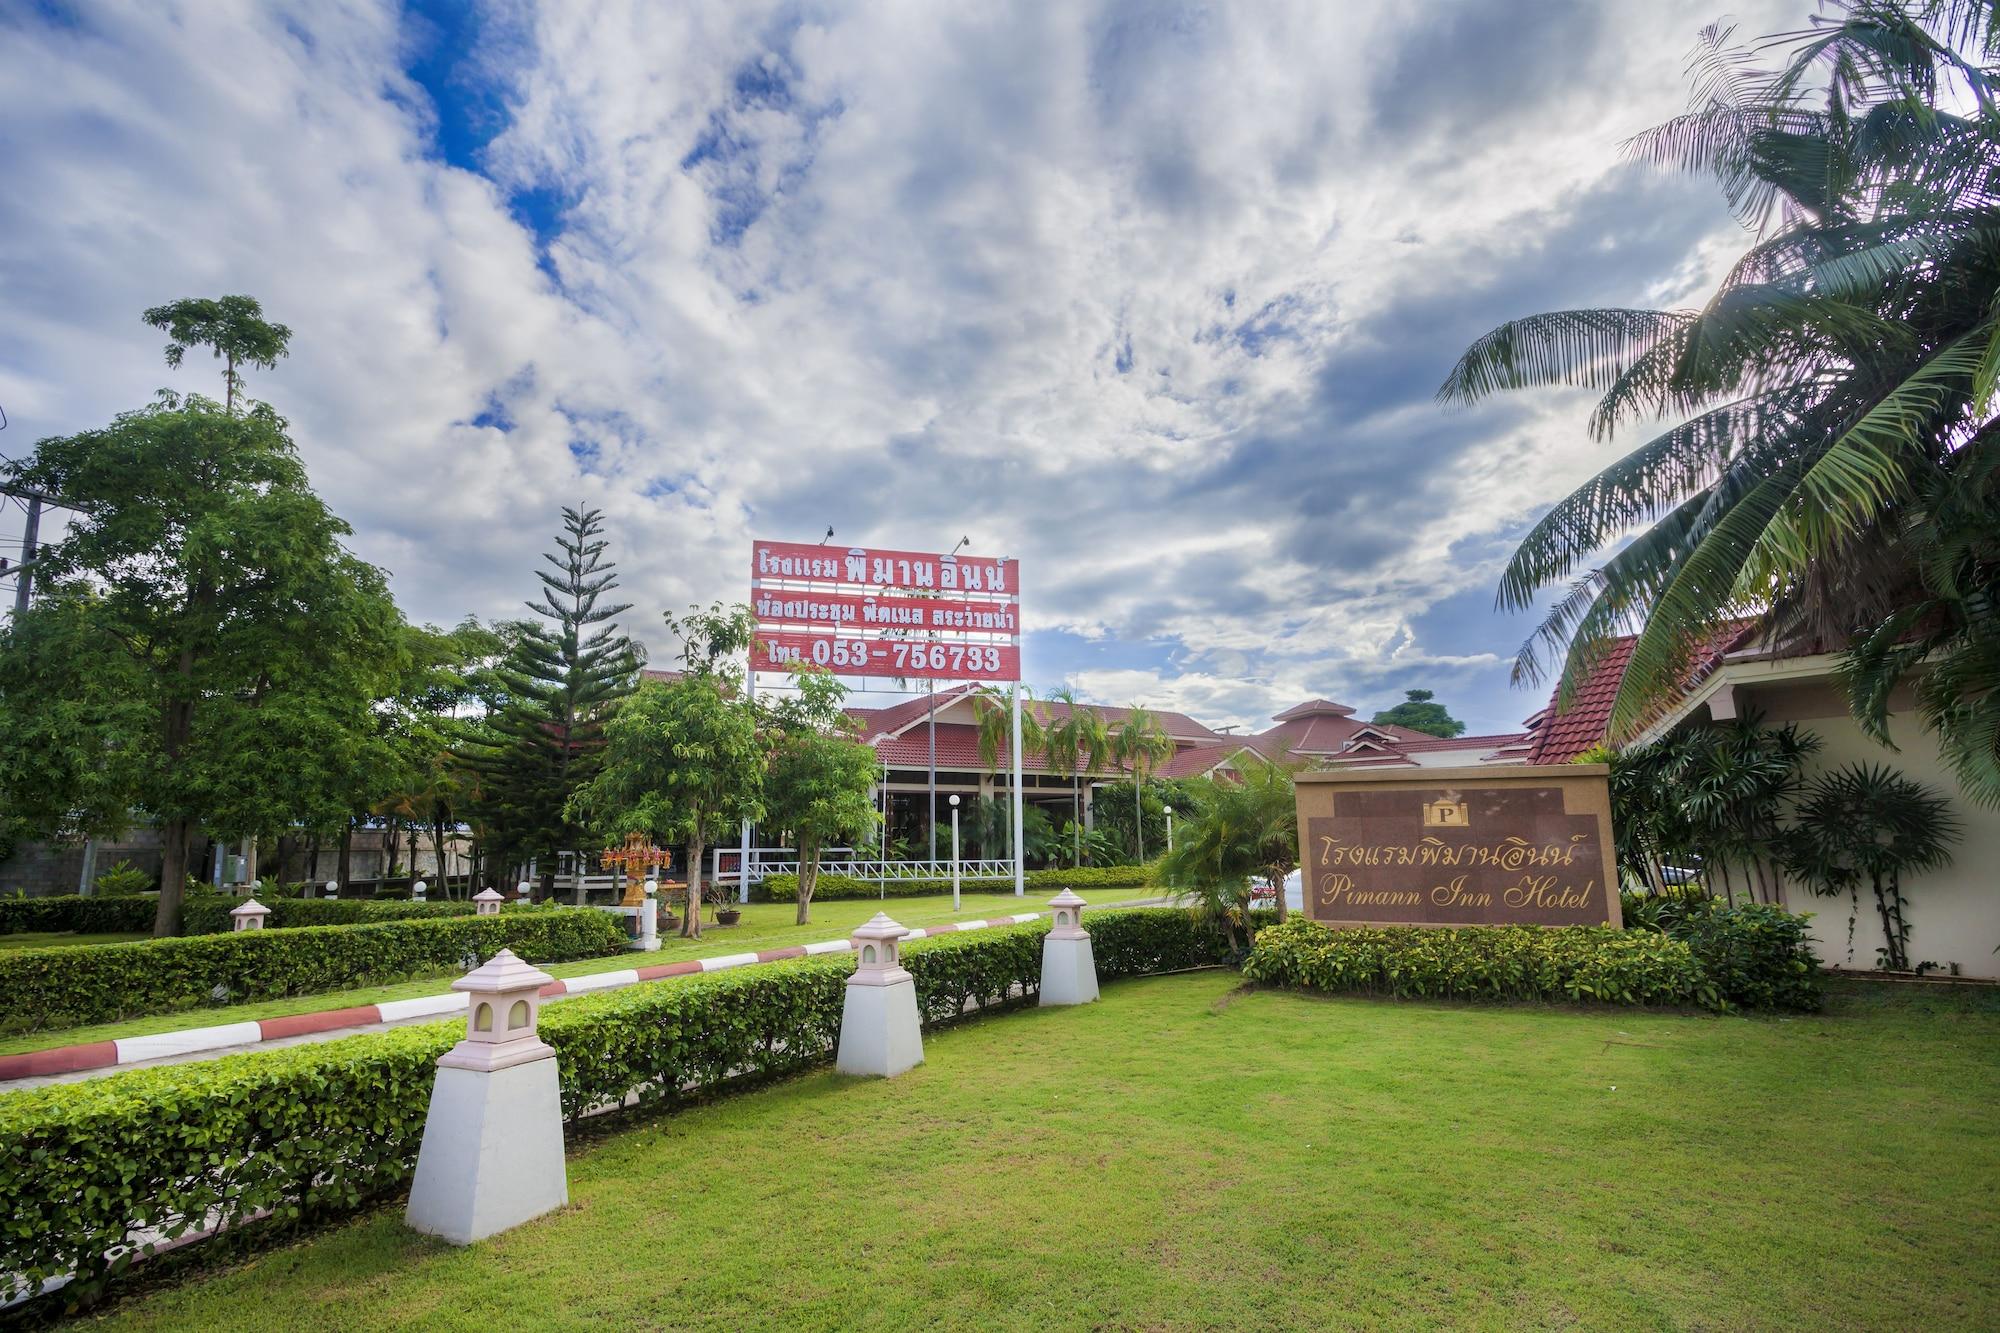 Pimann Inn Hotel, Muang Chiang Rai